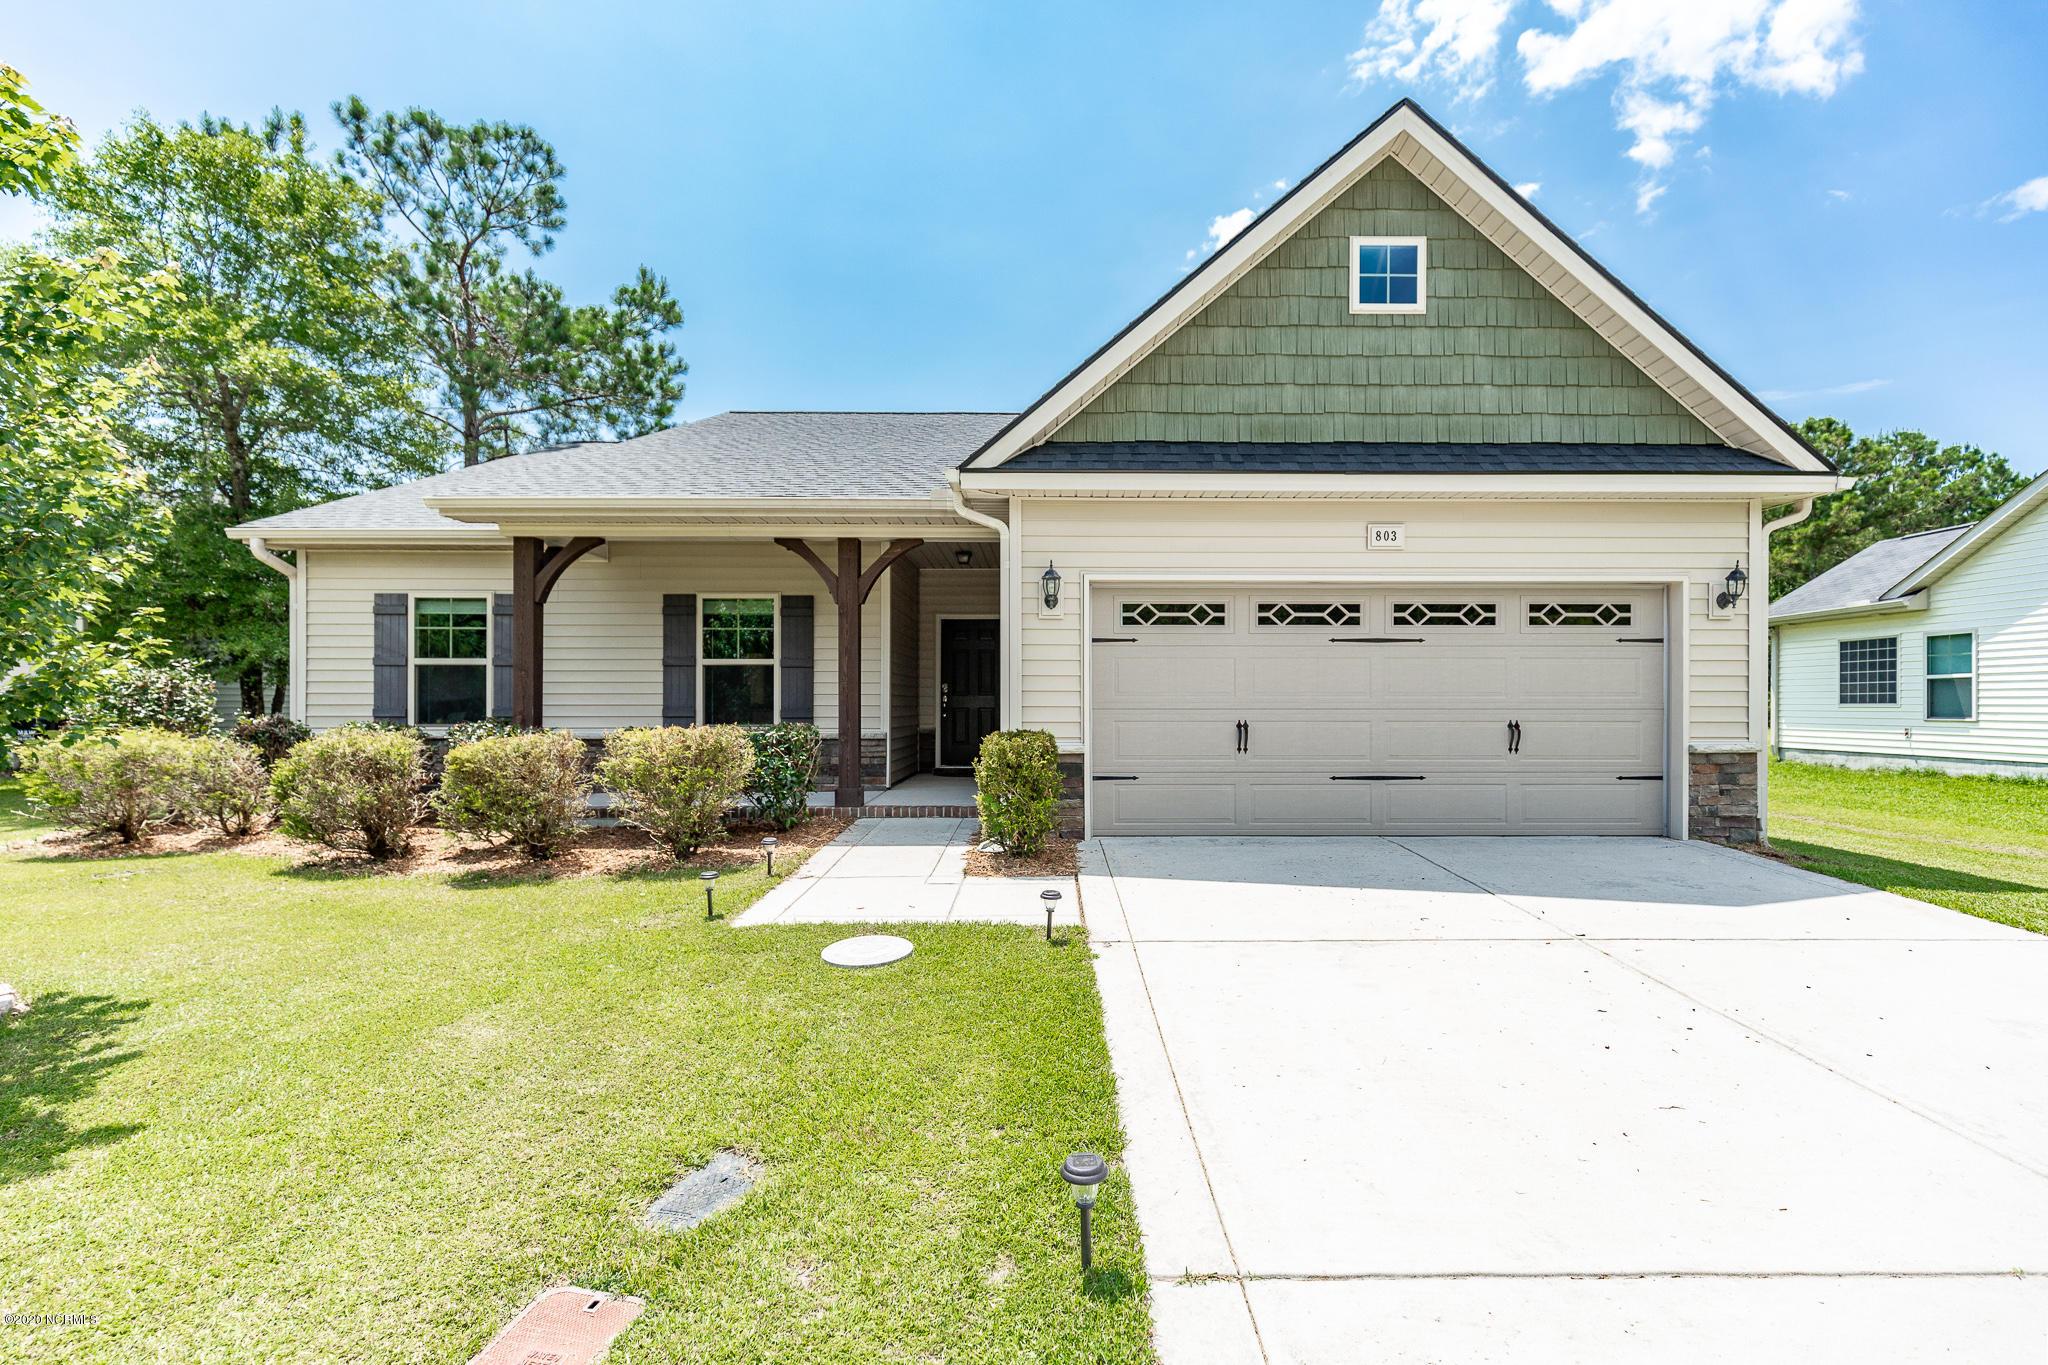 803 Lavender Court, Hubert, North Carolina 28539, 3 Bedrooms Bedrooms, ,2 BathroomsBathrooms,Residential,For Sale,Lavender,100225217